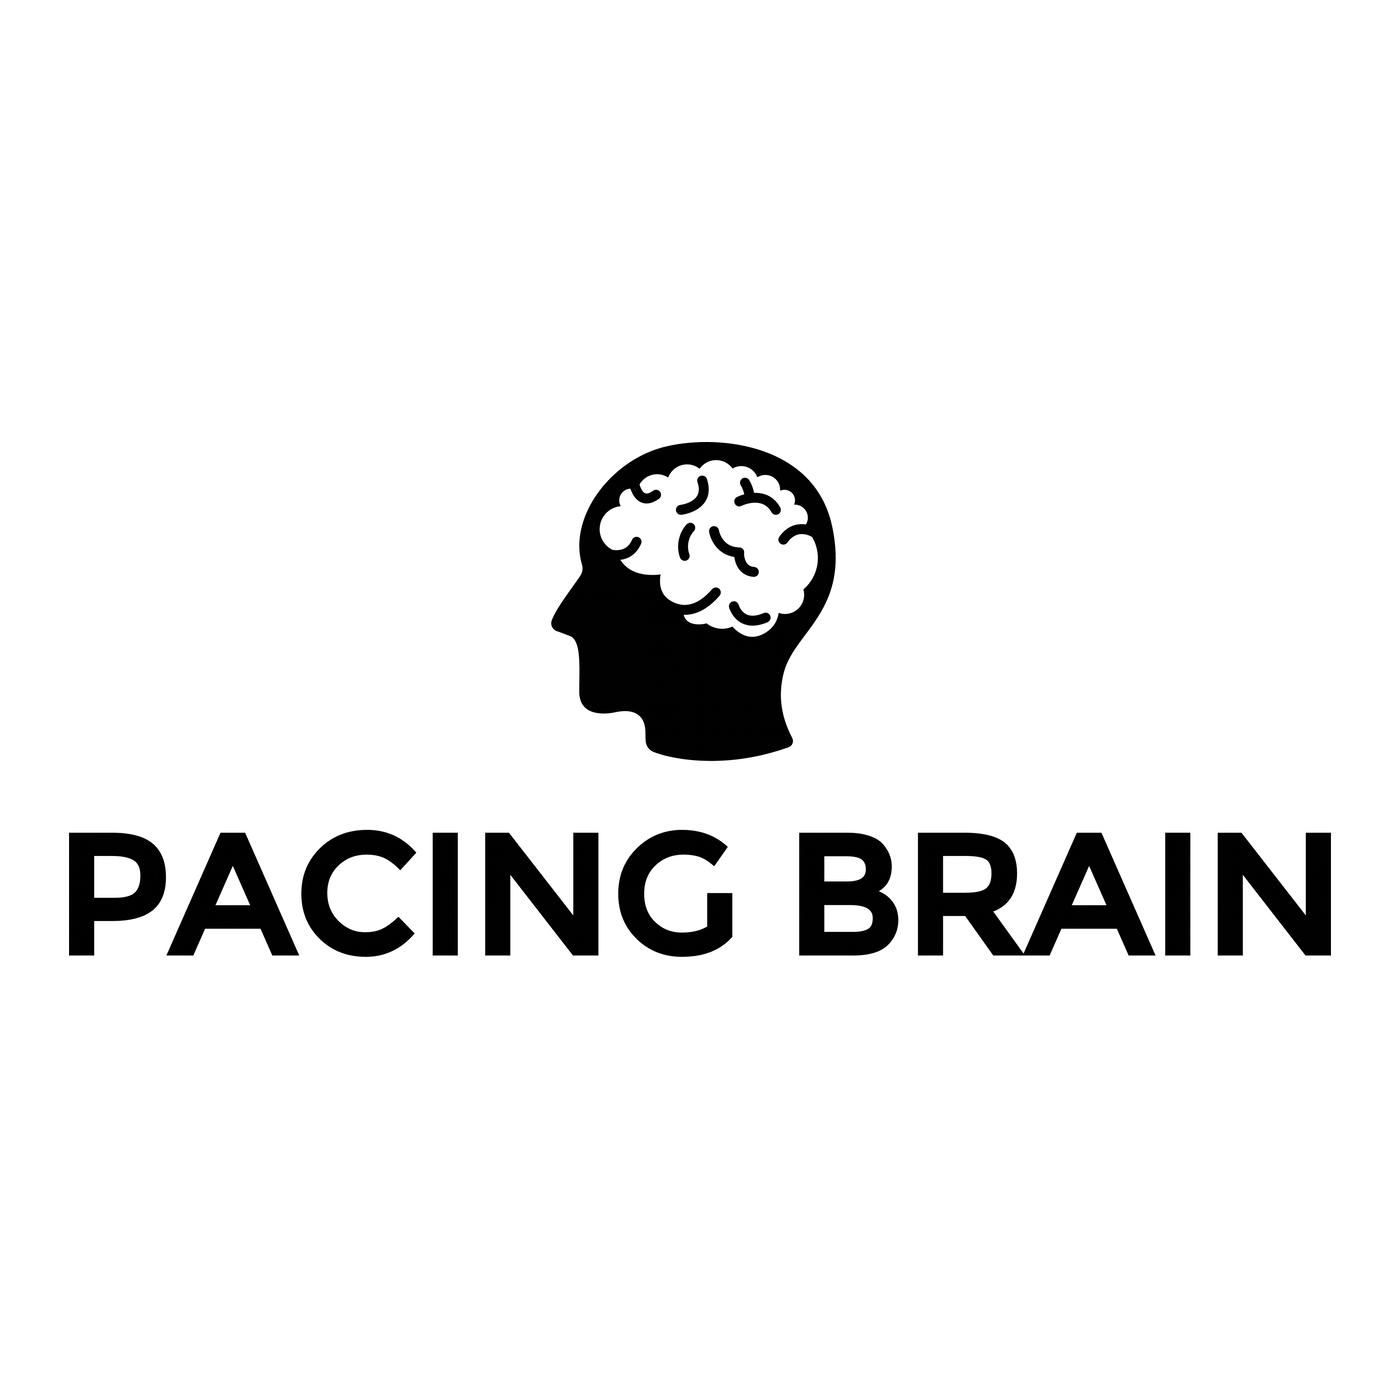 Pacing Brain